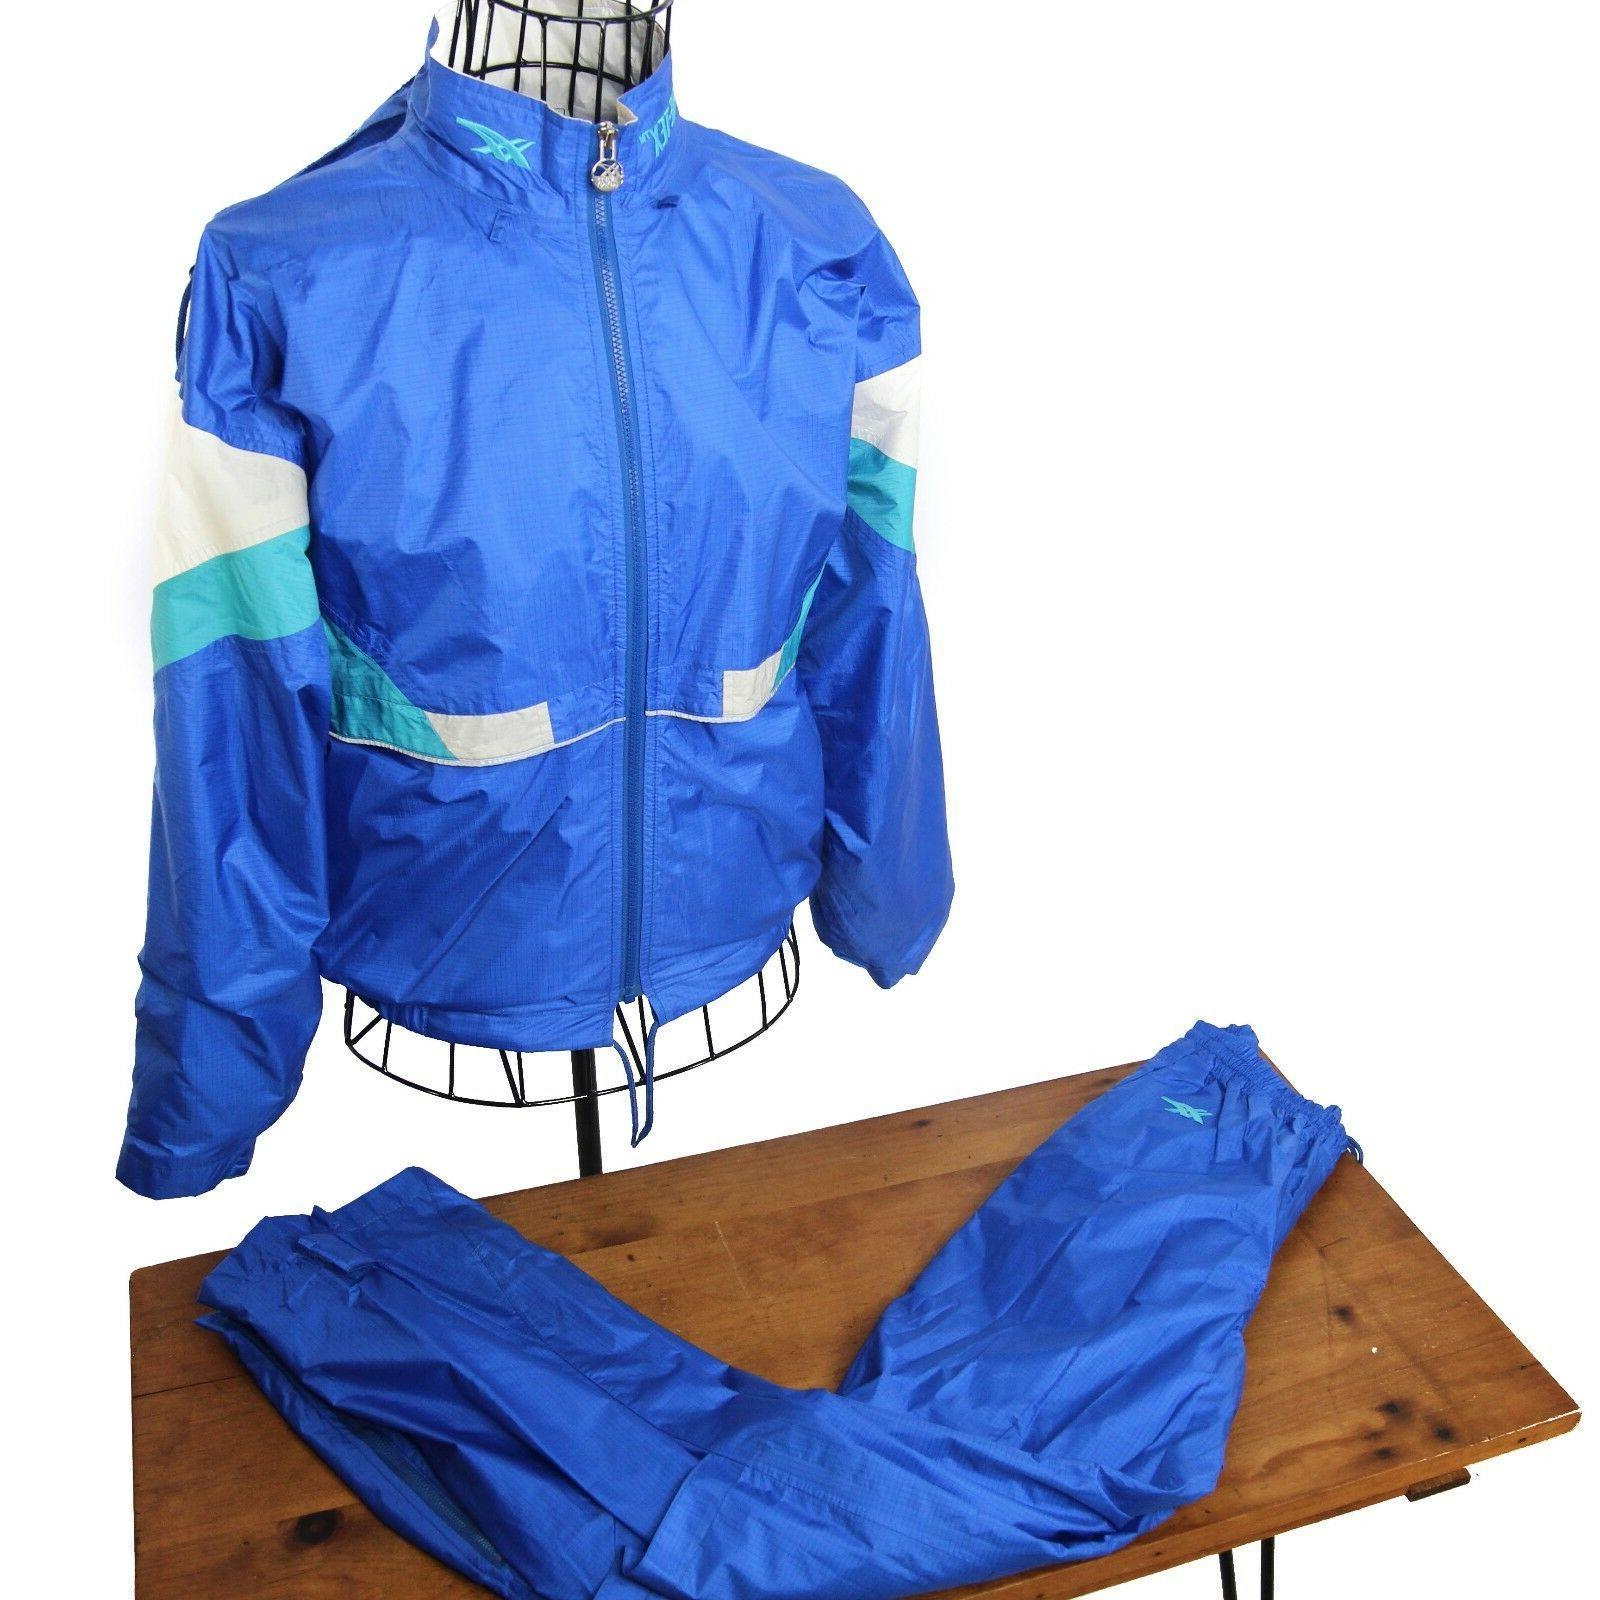 Vintage Asics Gore-tex Lined Track Jogging Suit Mens Medium